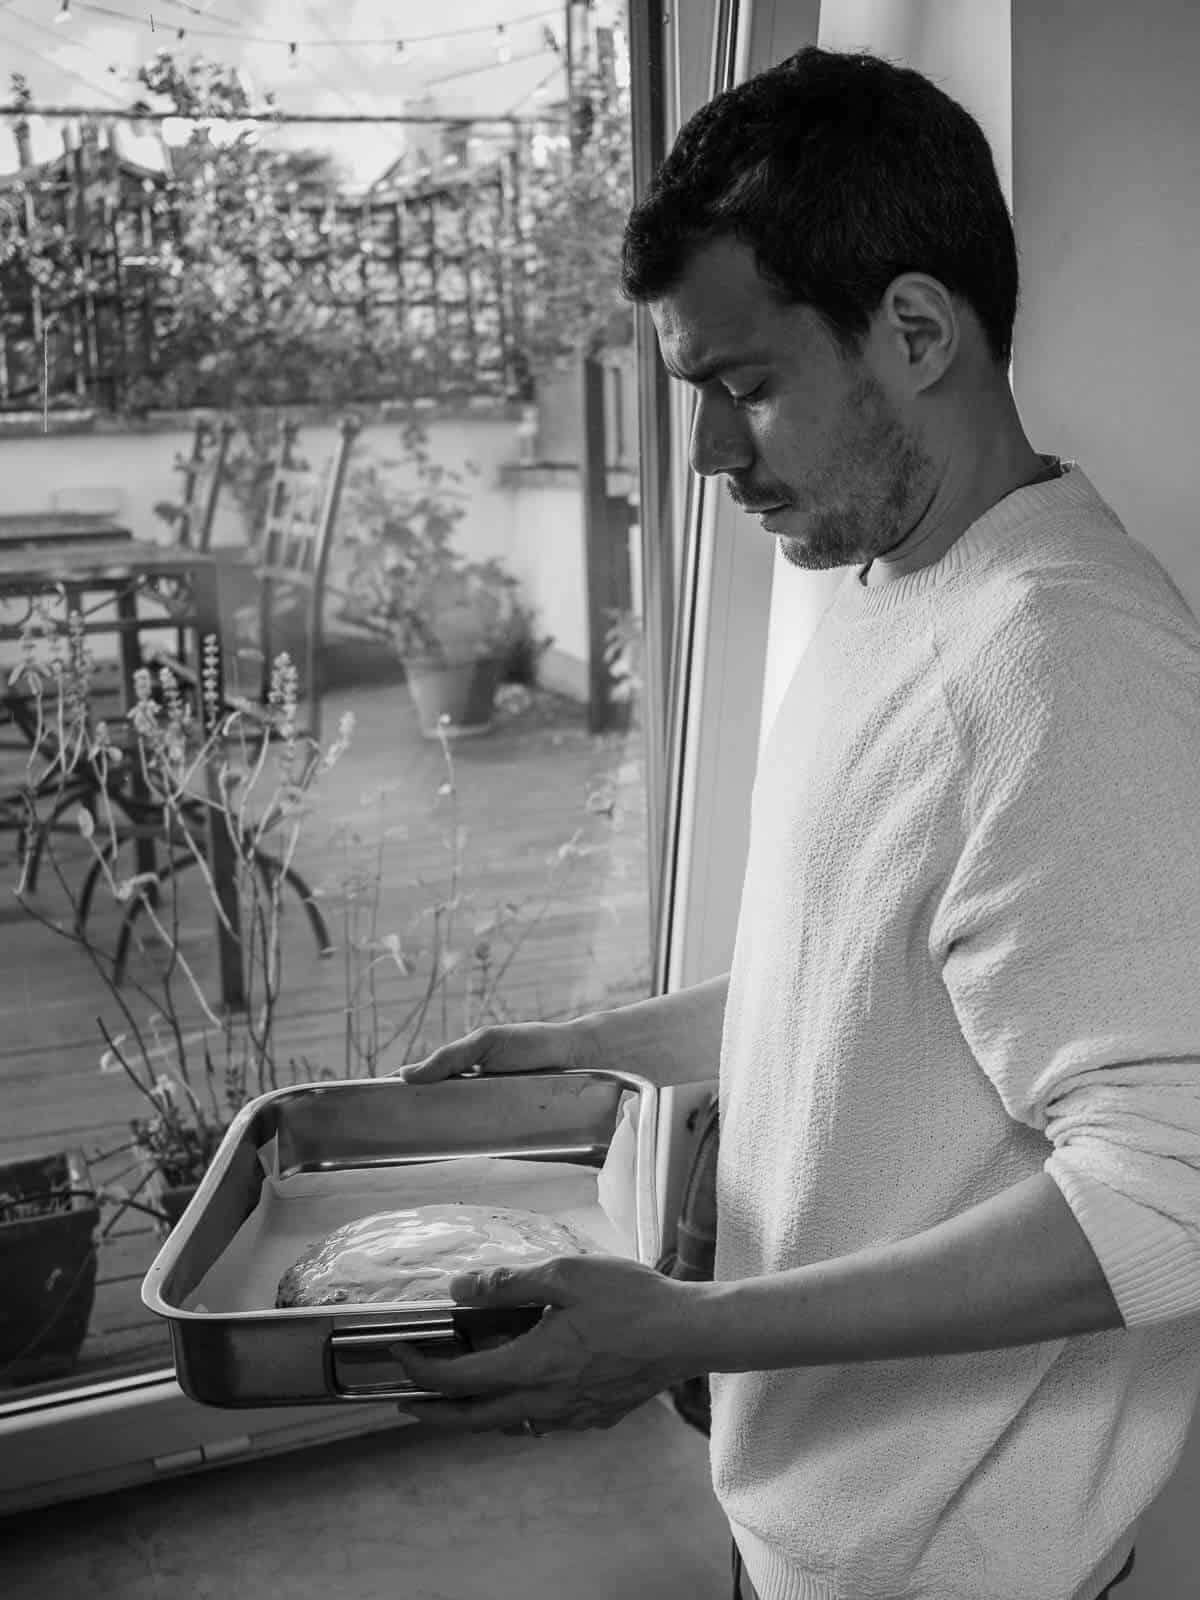 Gus taking pangiallo romano to the oven